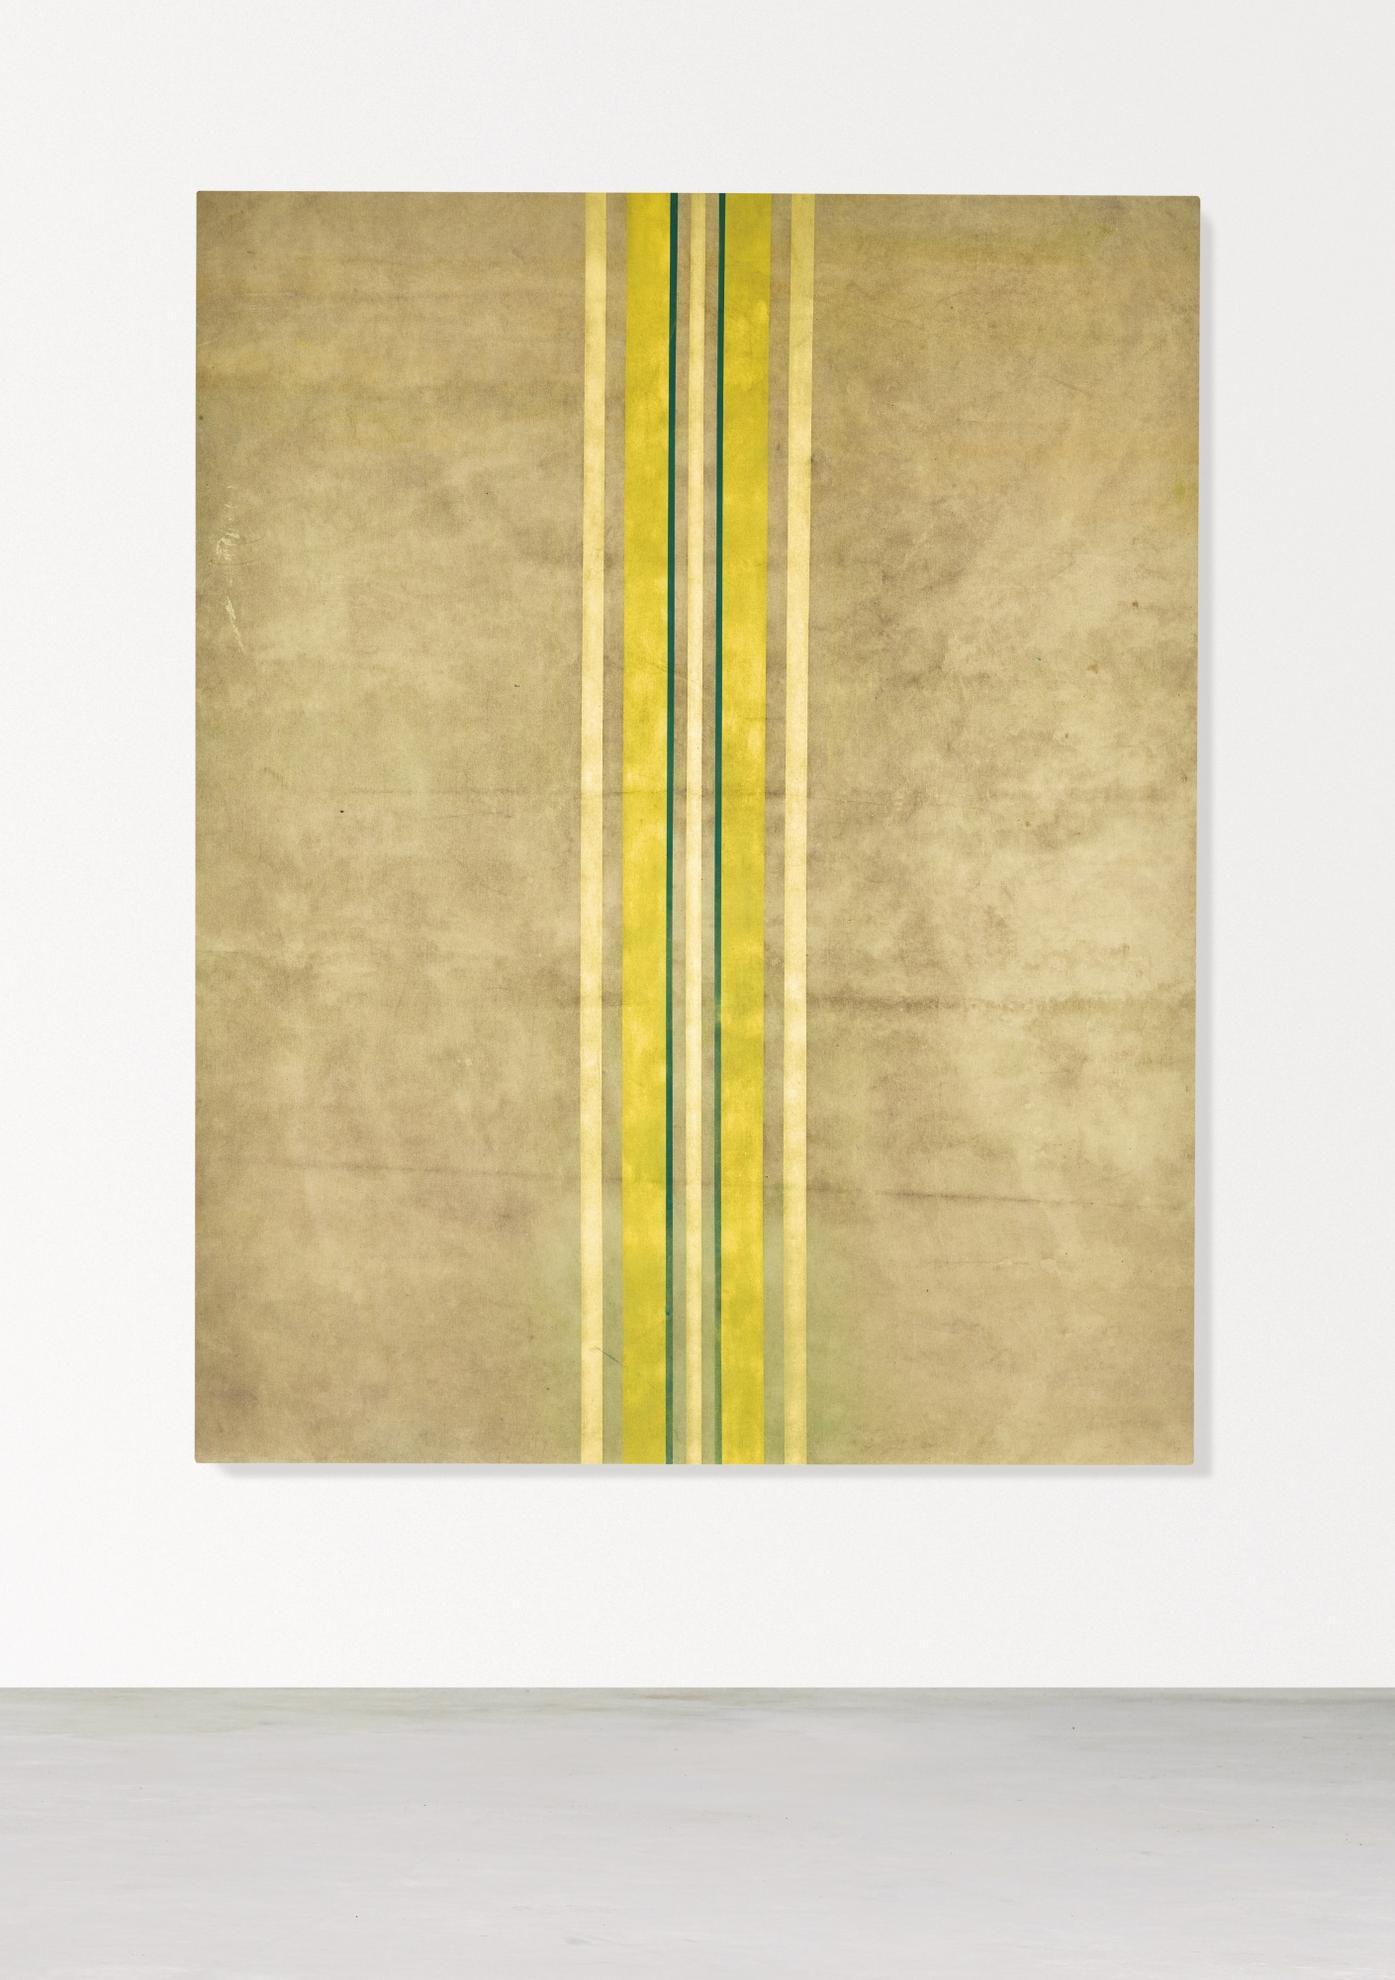 Fredrik Vaerslev-Untitled (Canopy Painting: Cream, Jade Green, Light Yellow And Yellow)-2012